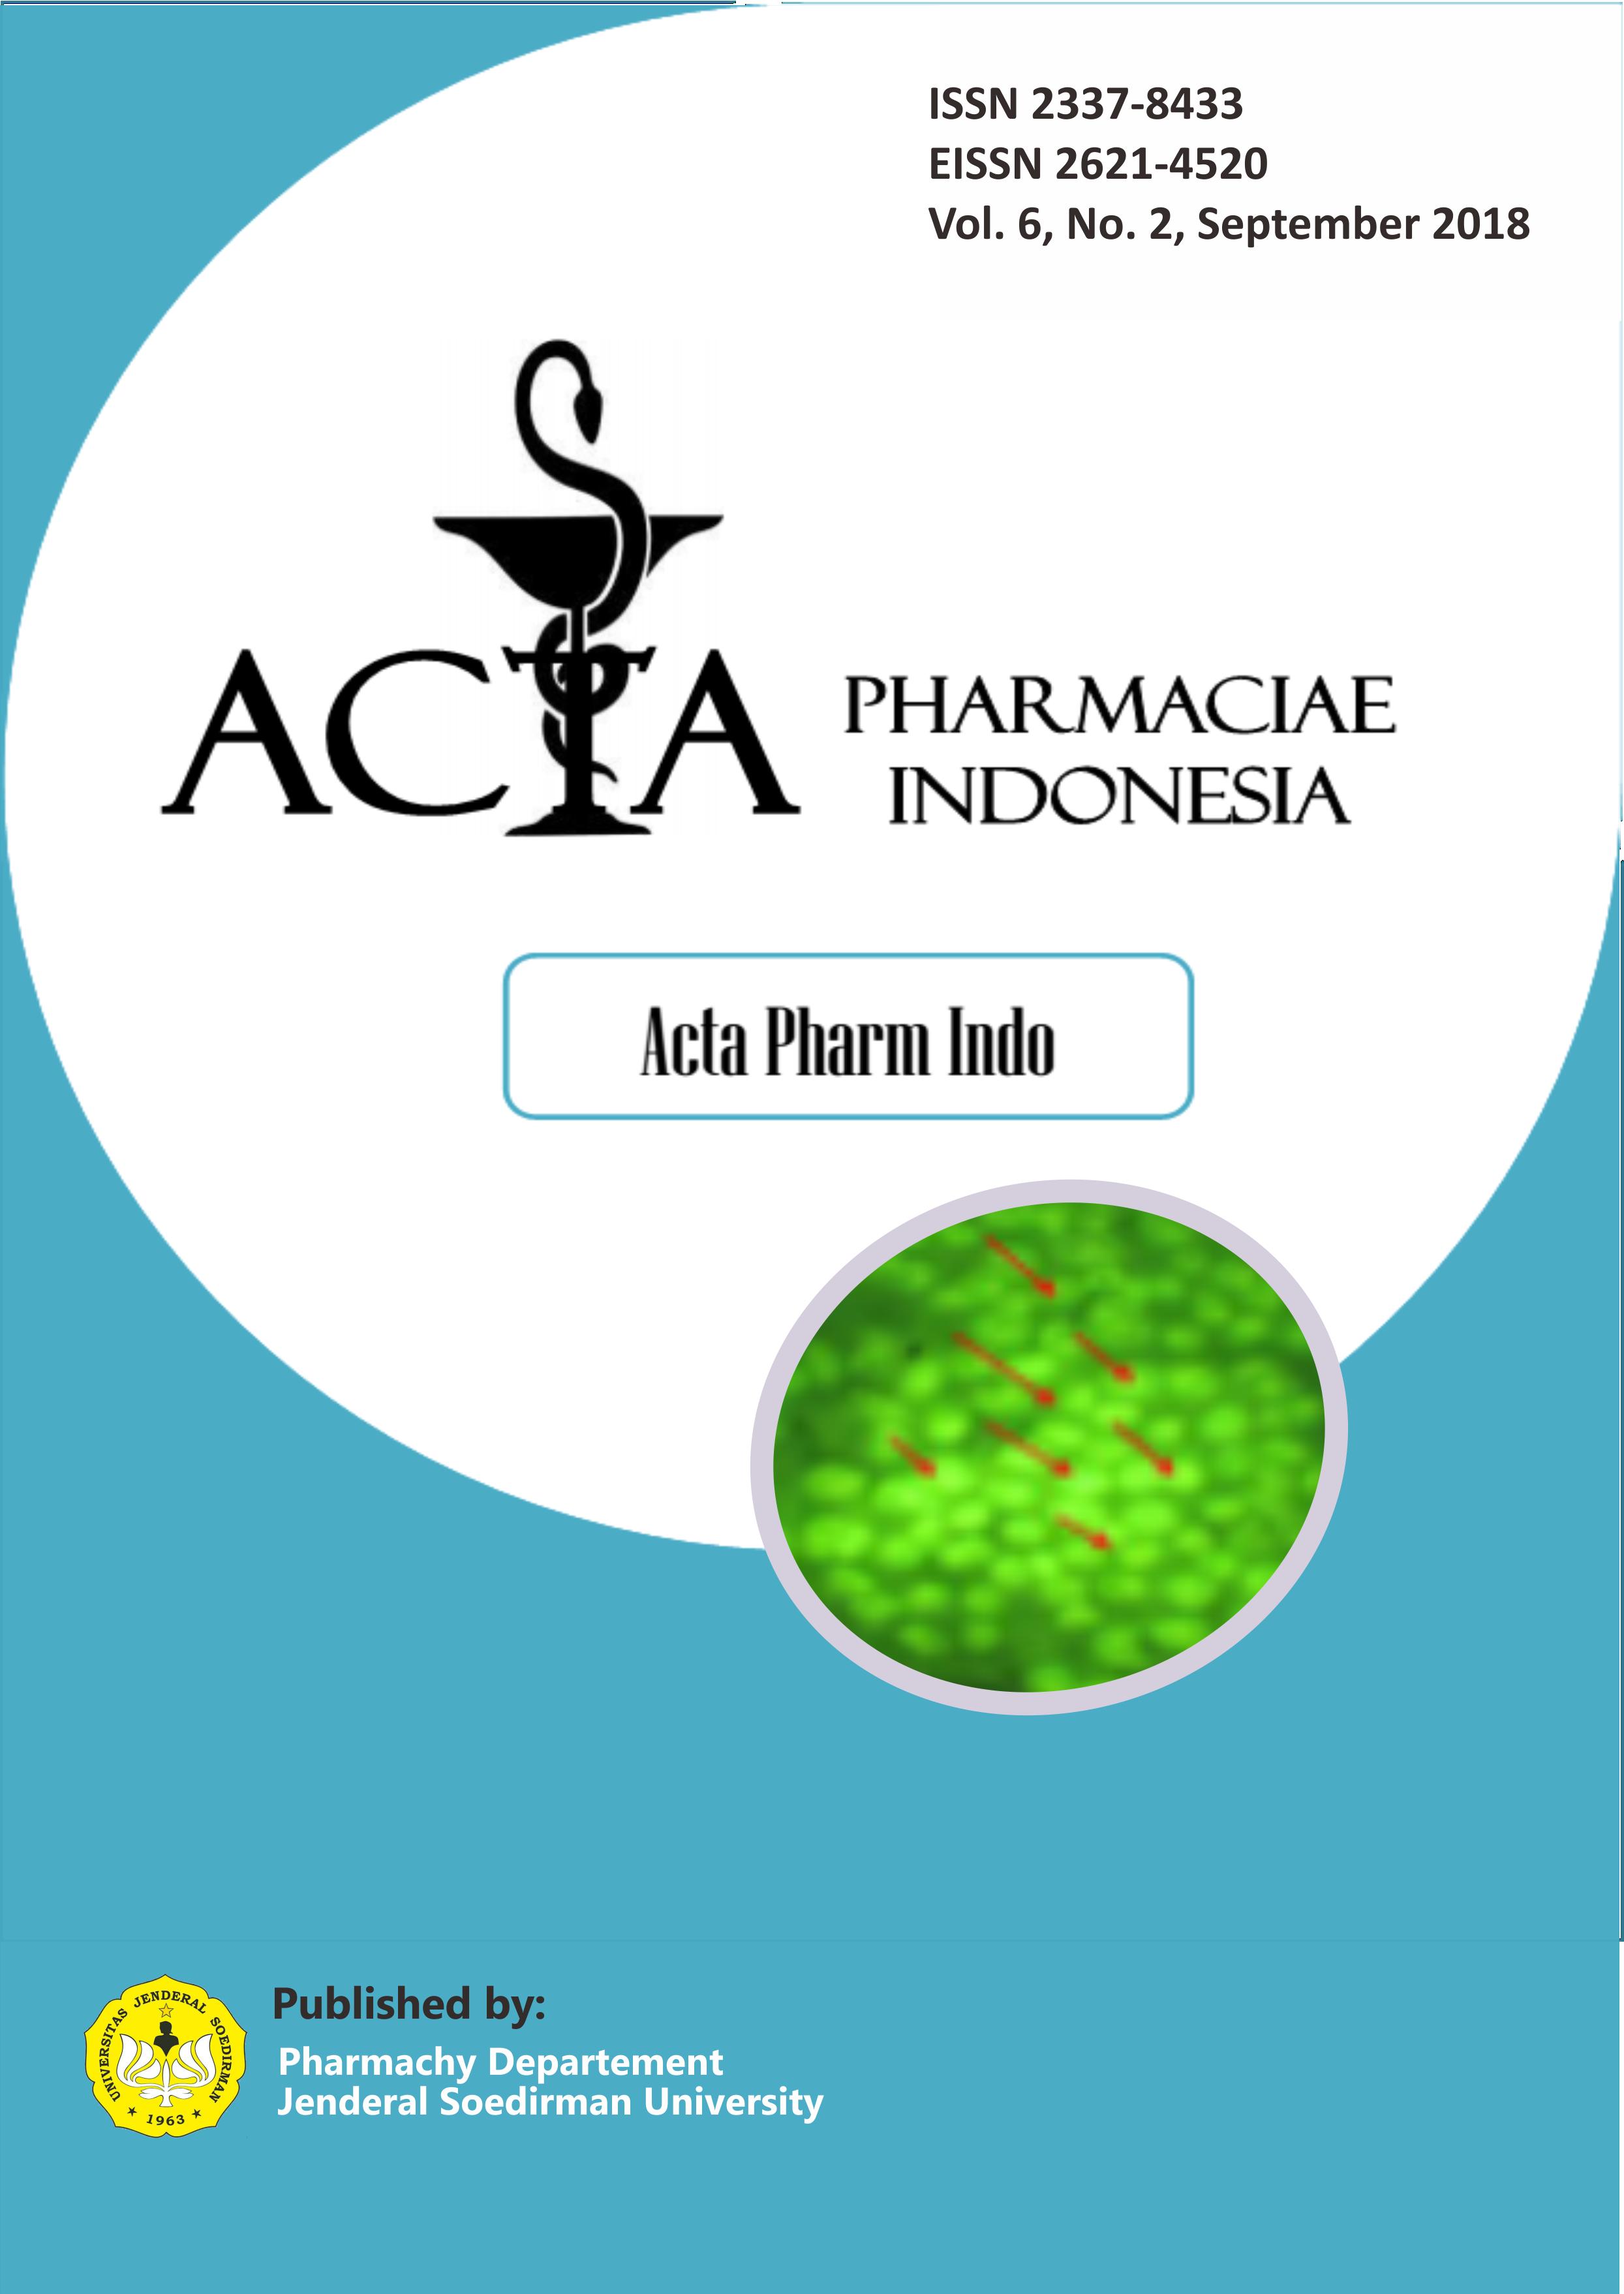 acta pharmaciae indonesia